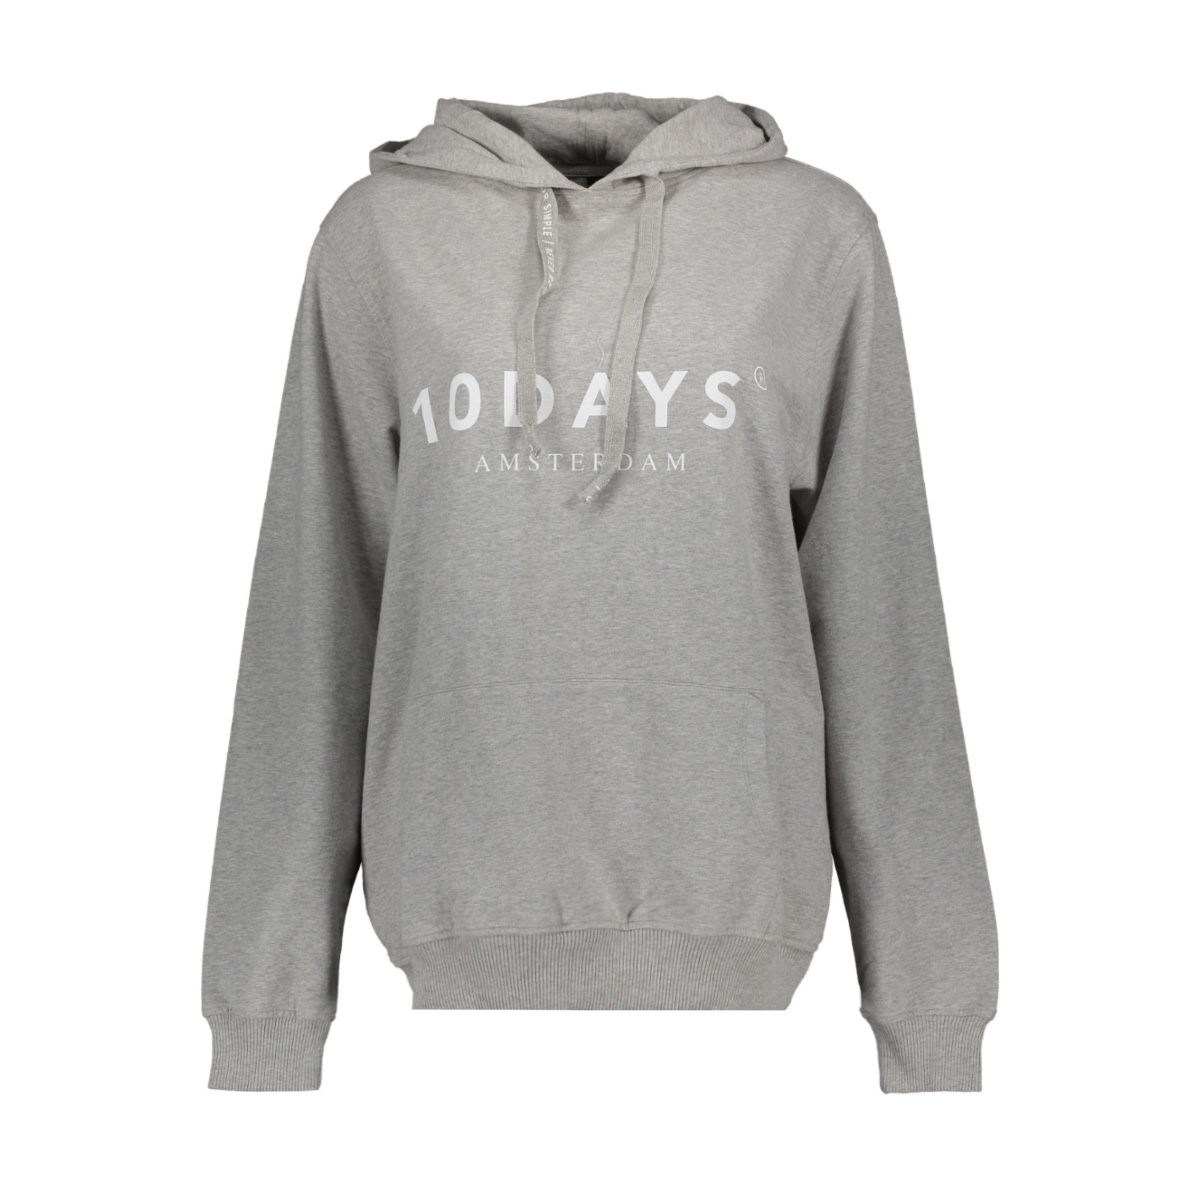 the hoodie 21 851 9900 10 days sweater light grey melange